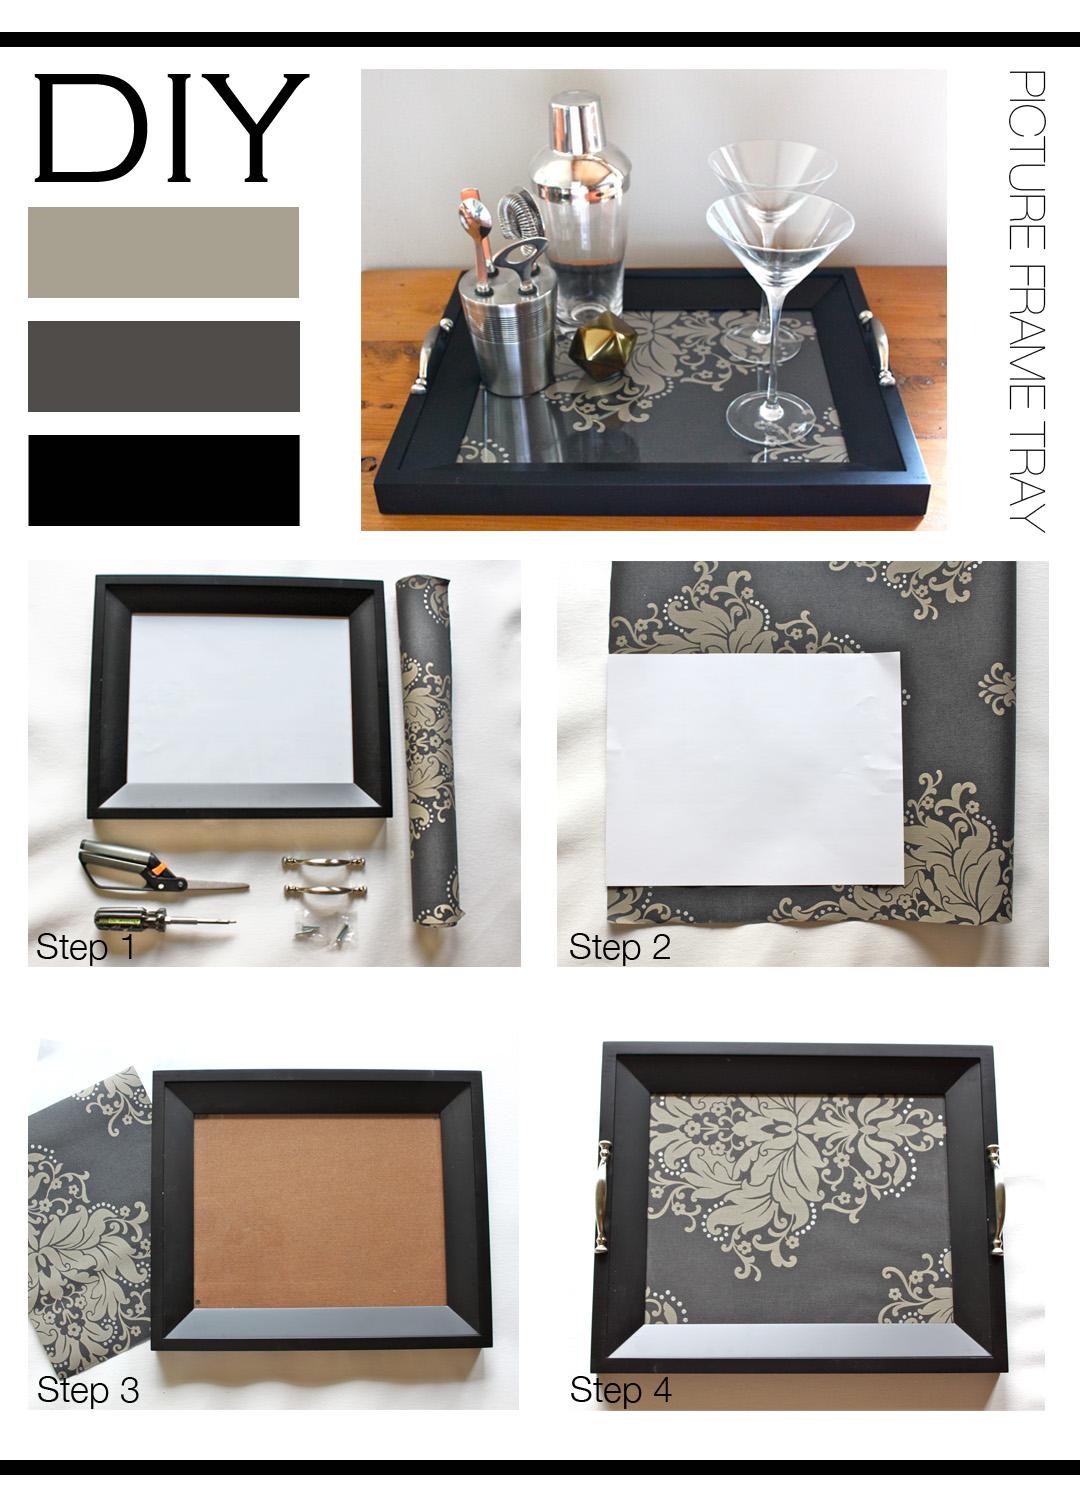 diy picture frame tray mountain home decor